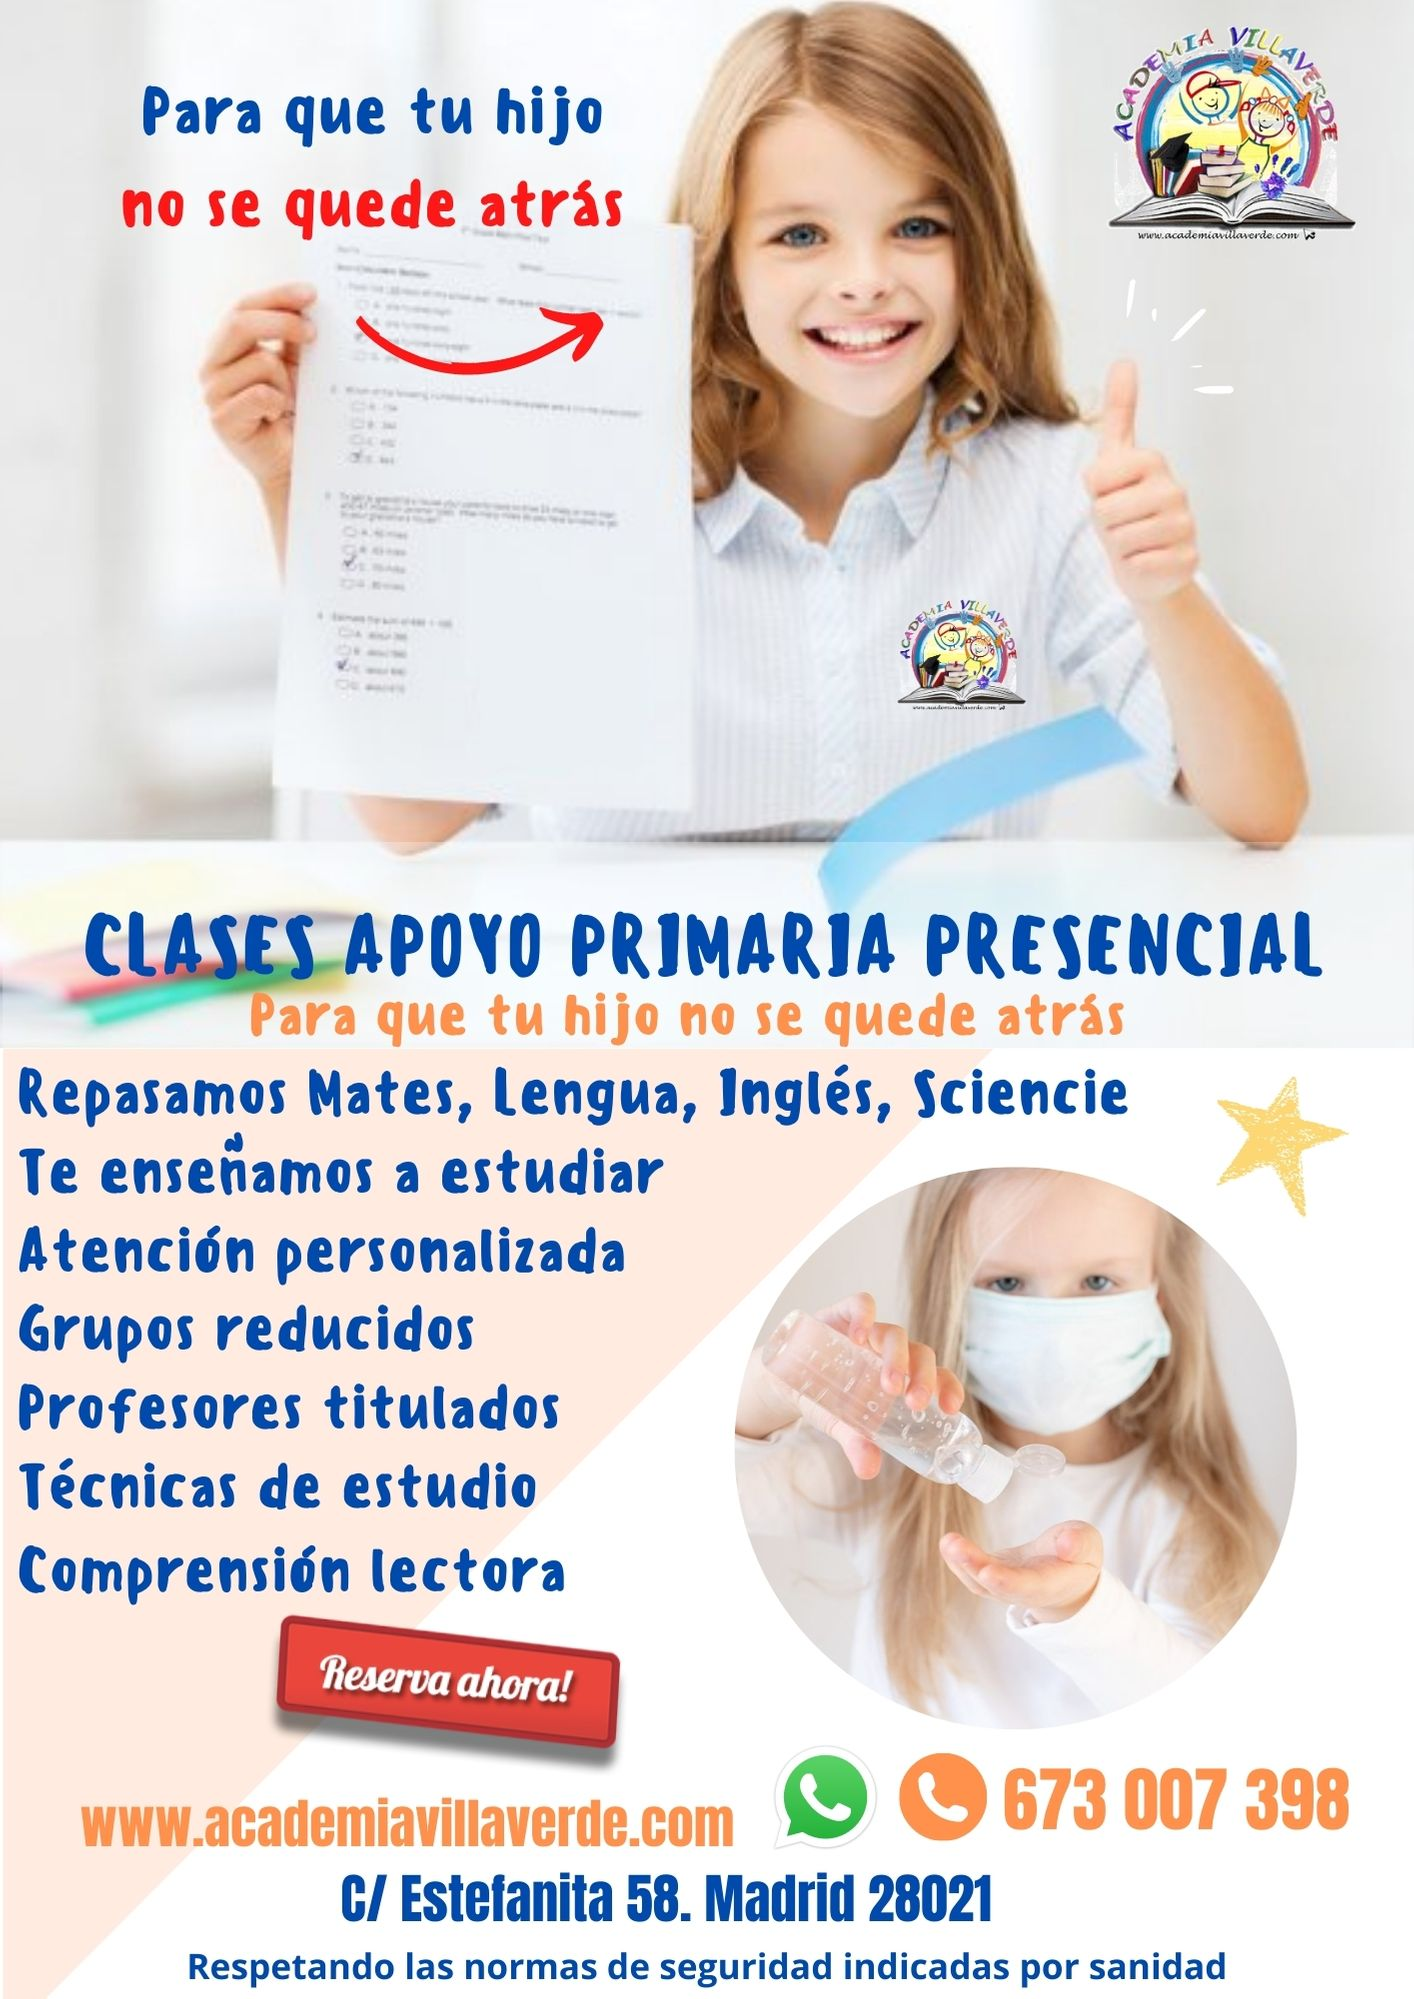 presencial-academia-villaverde-2020